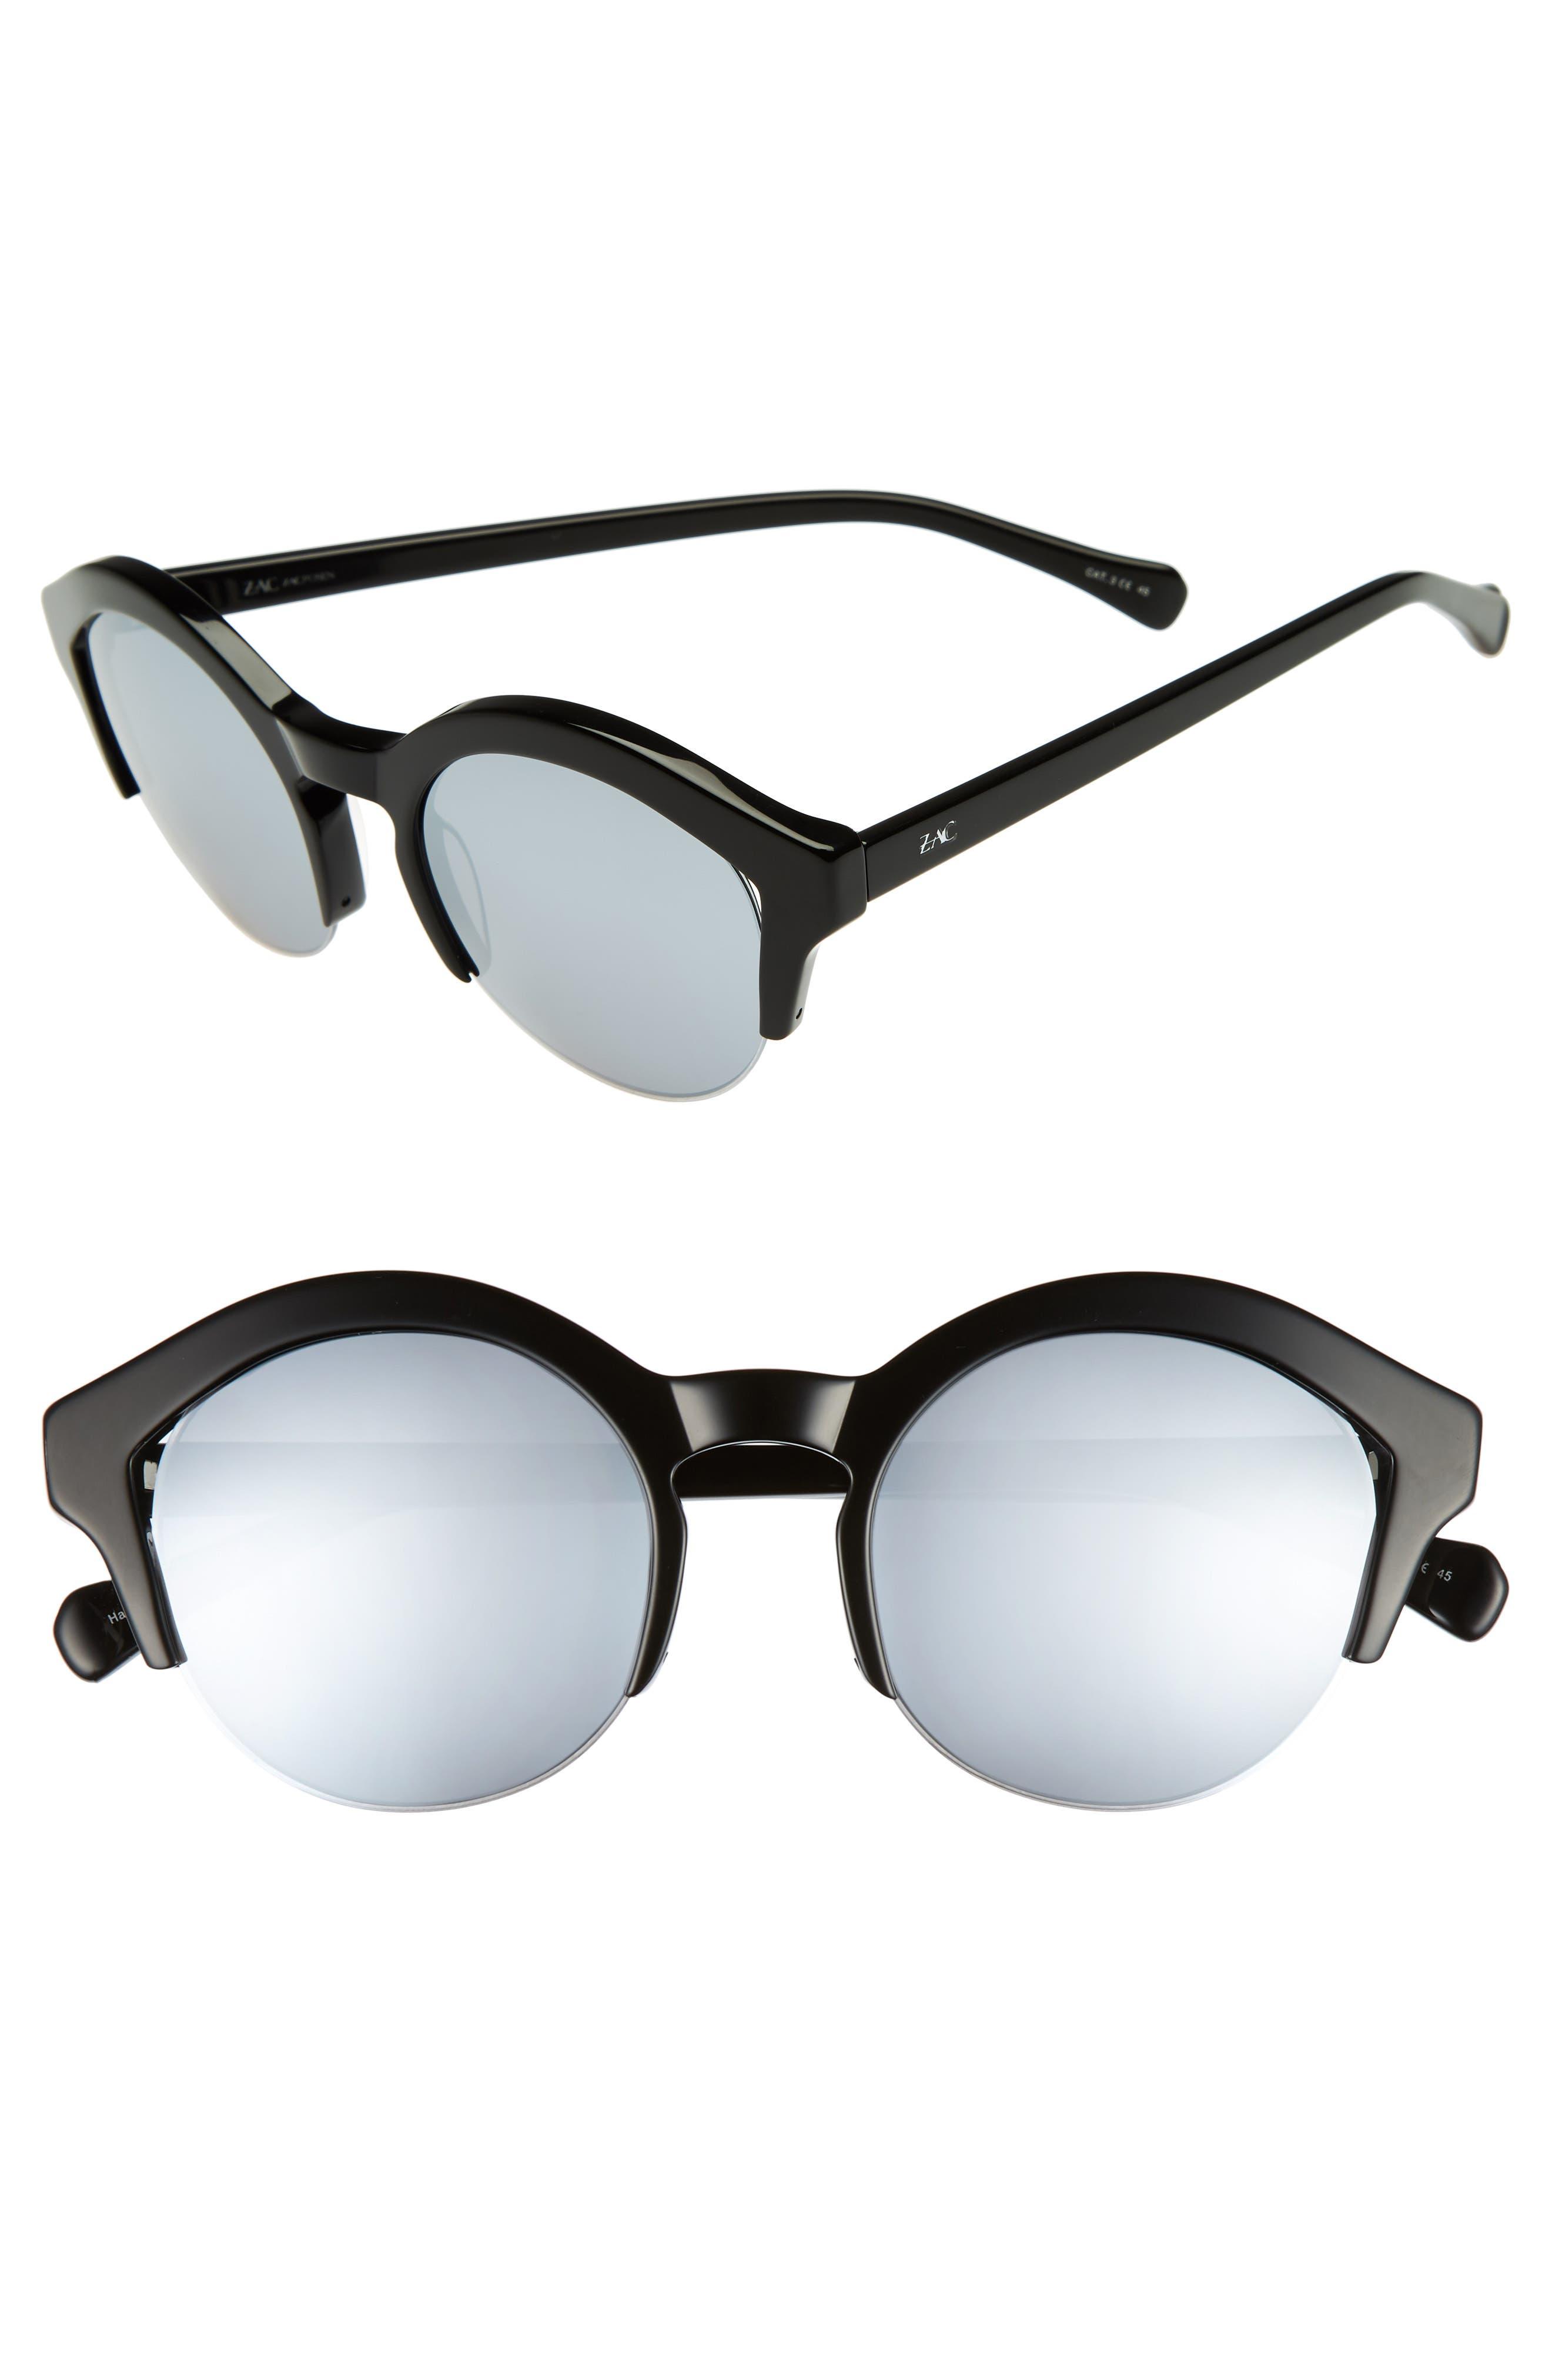 Bren 51mm Half-Rim Sunglasses,                             Main thumbnail 1, color,                             BLACK/ SILVER